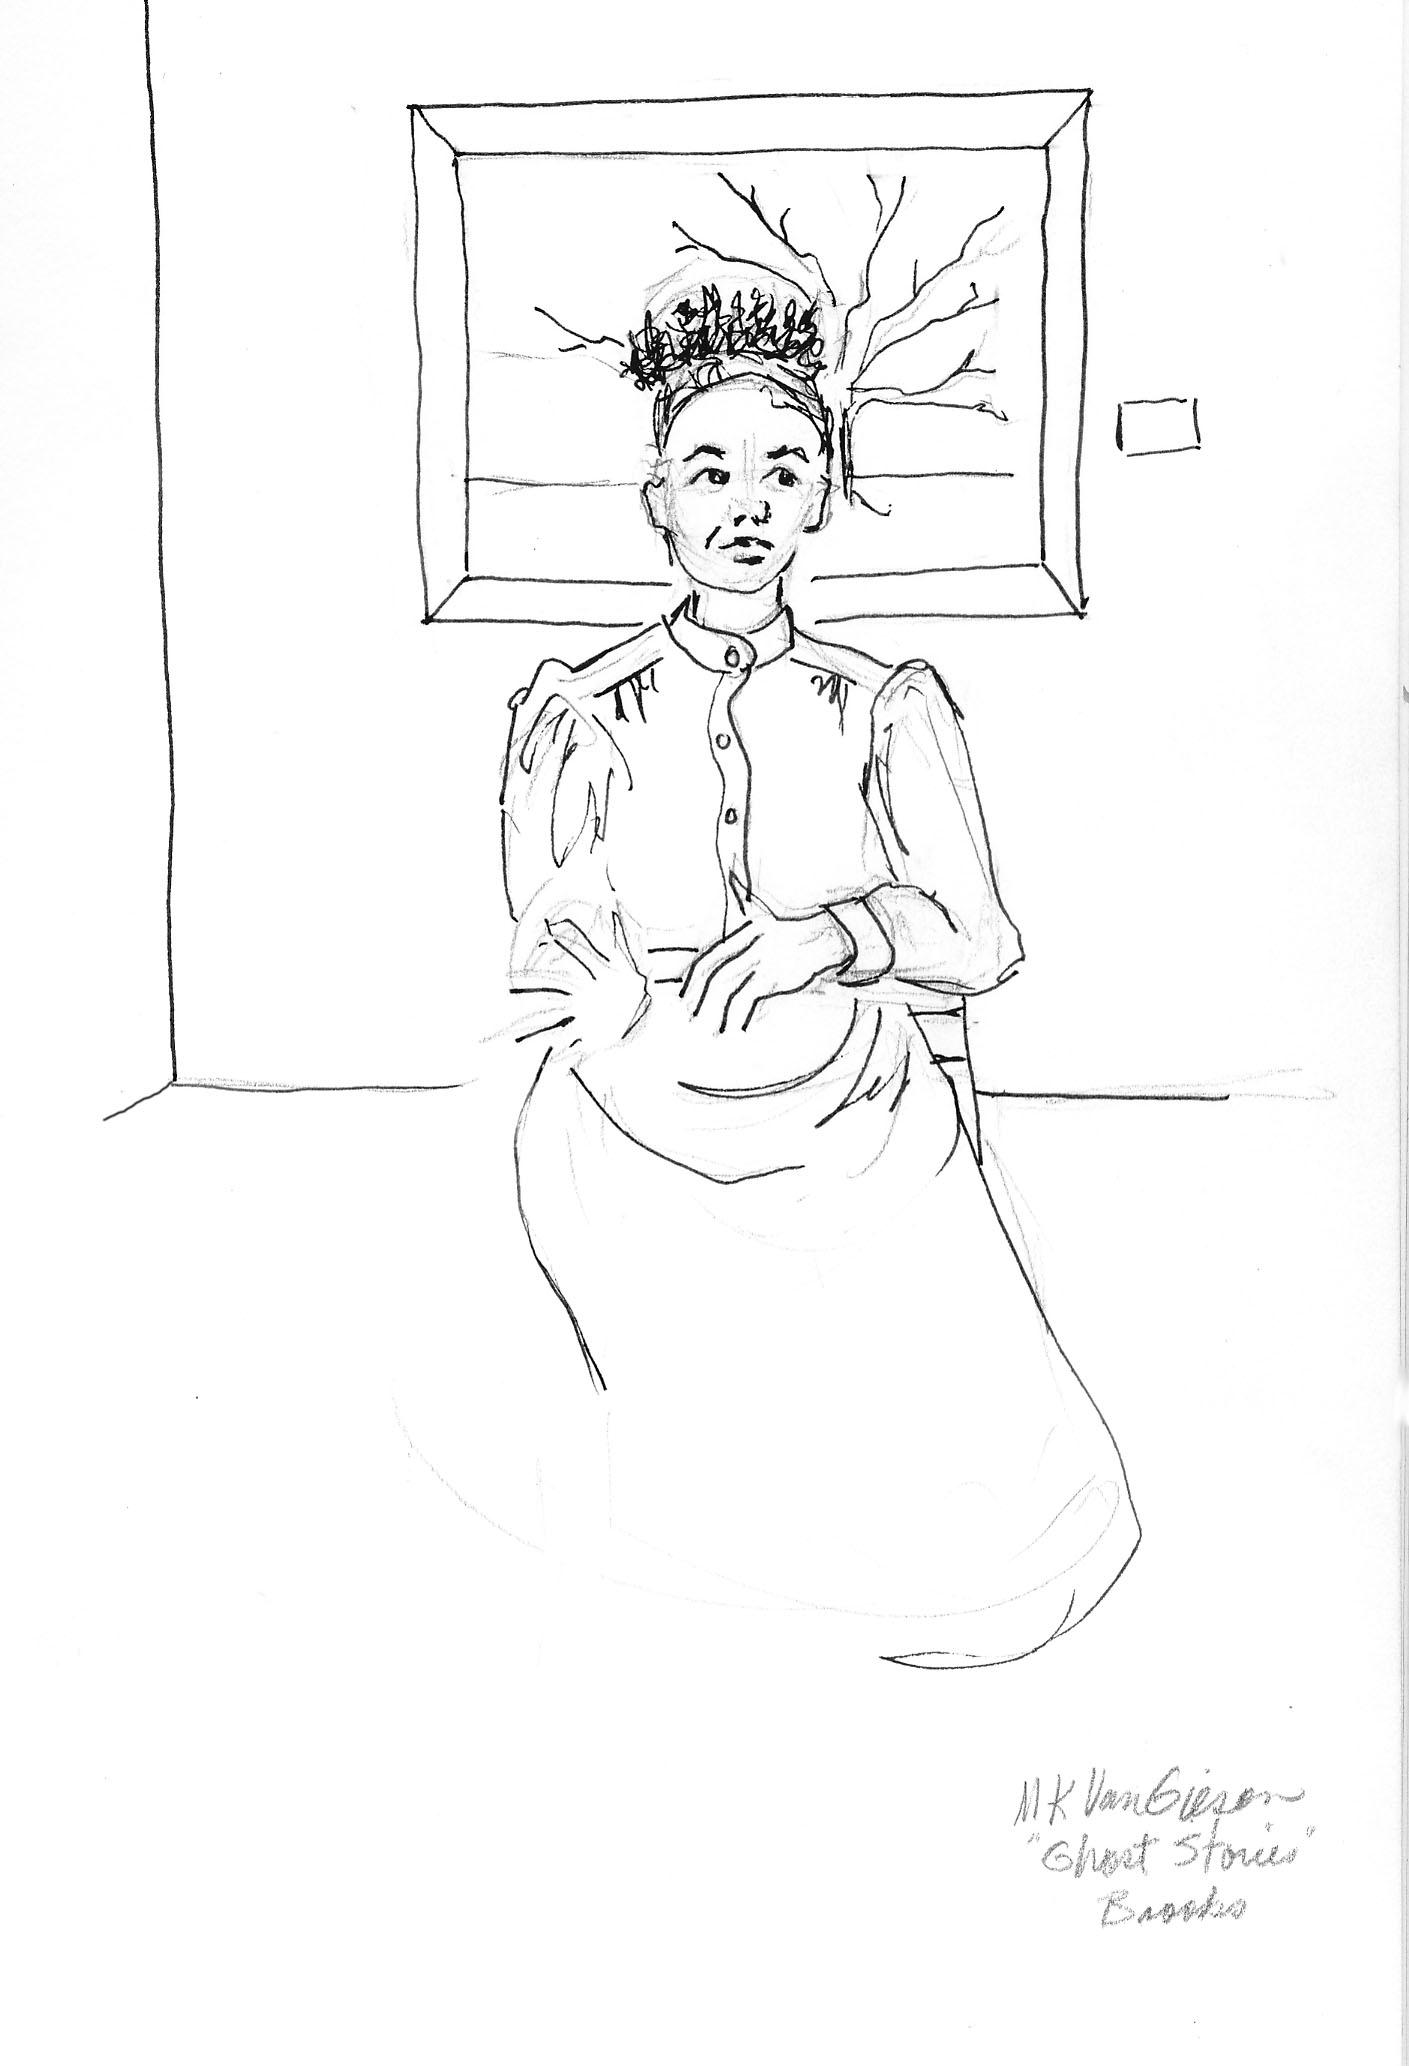 ghost stories-Mary K VanGieson